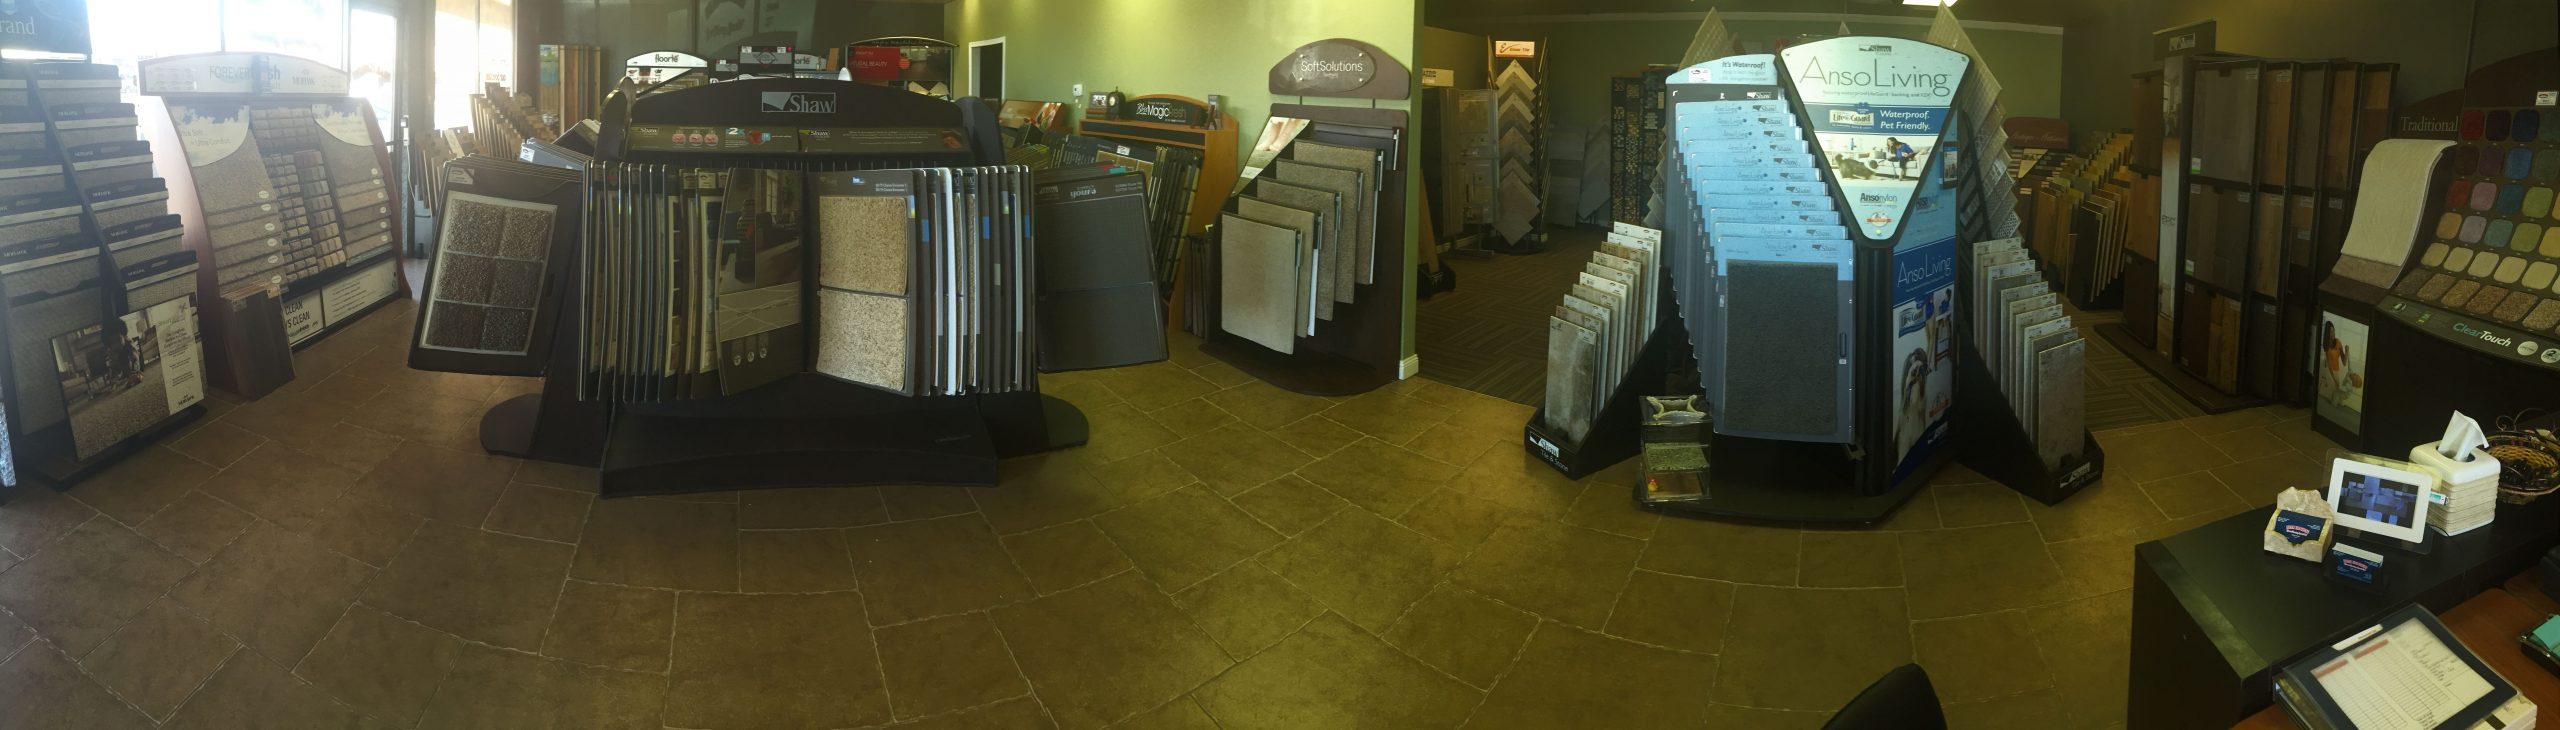 Warehouse in Sun City AZ | Bram Flooring